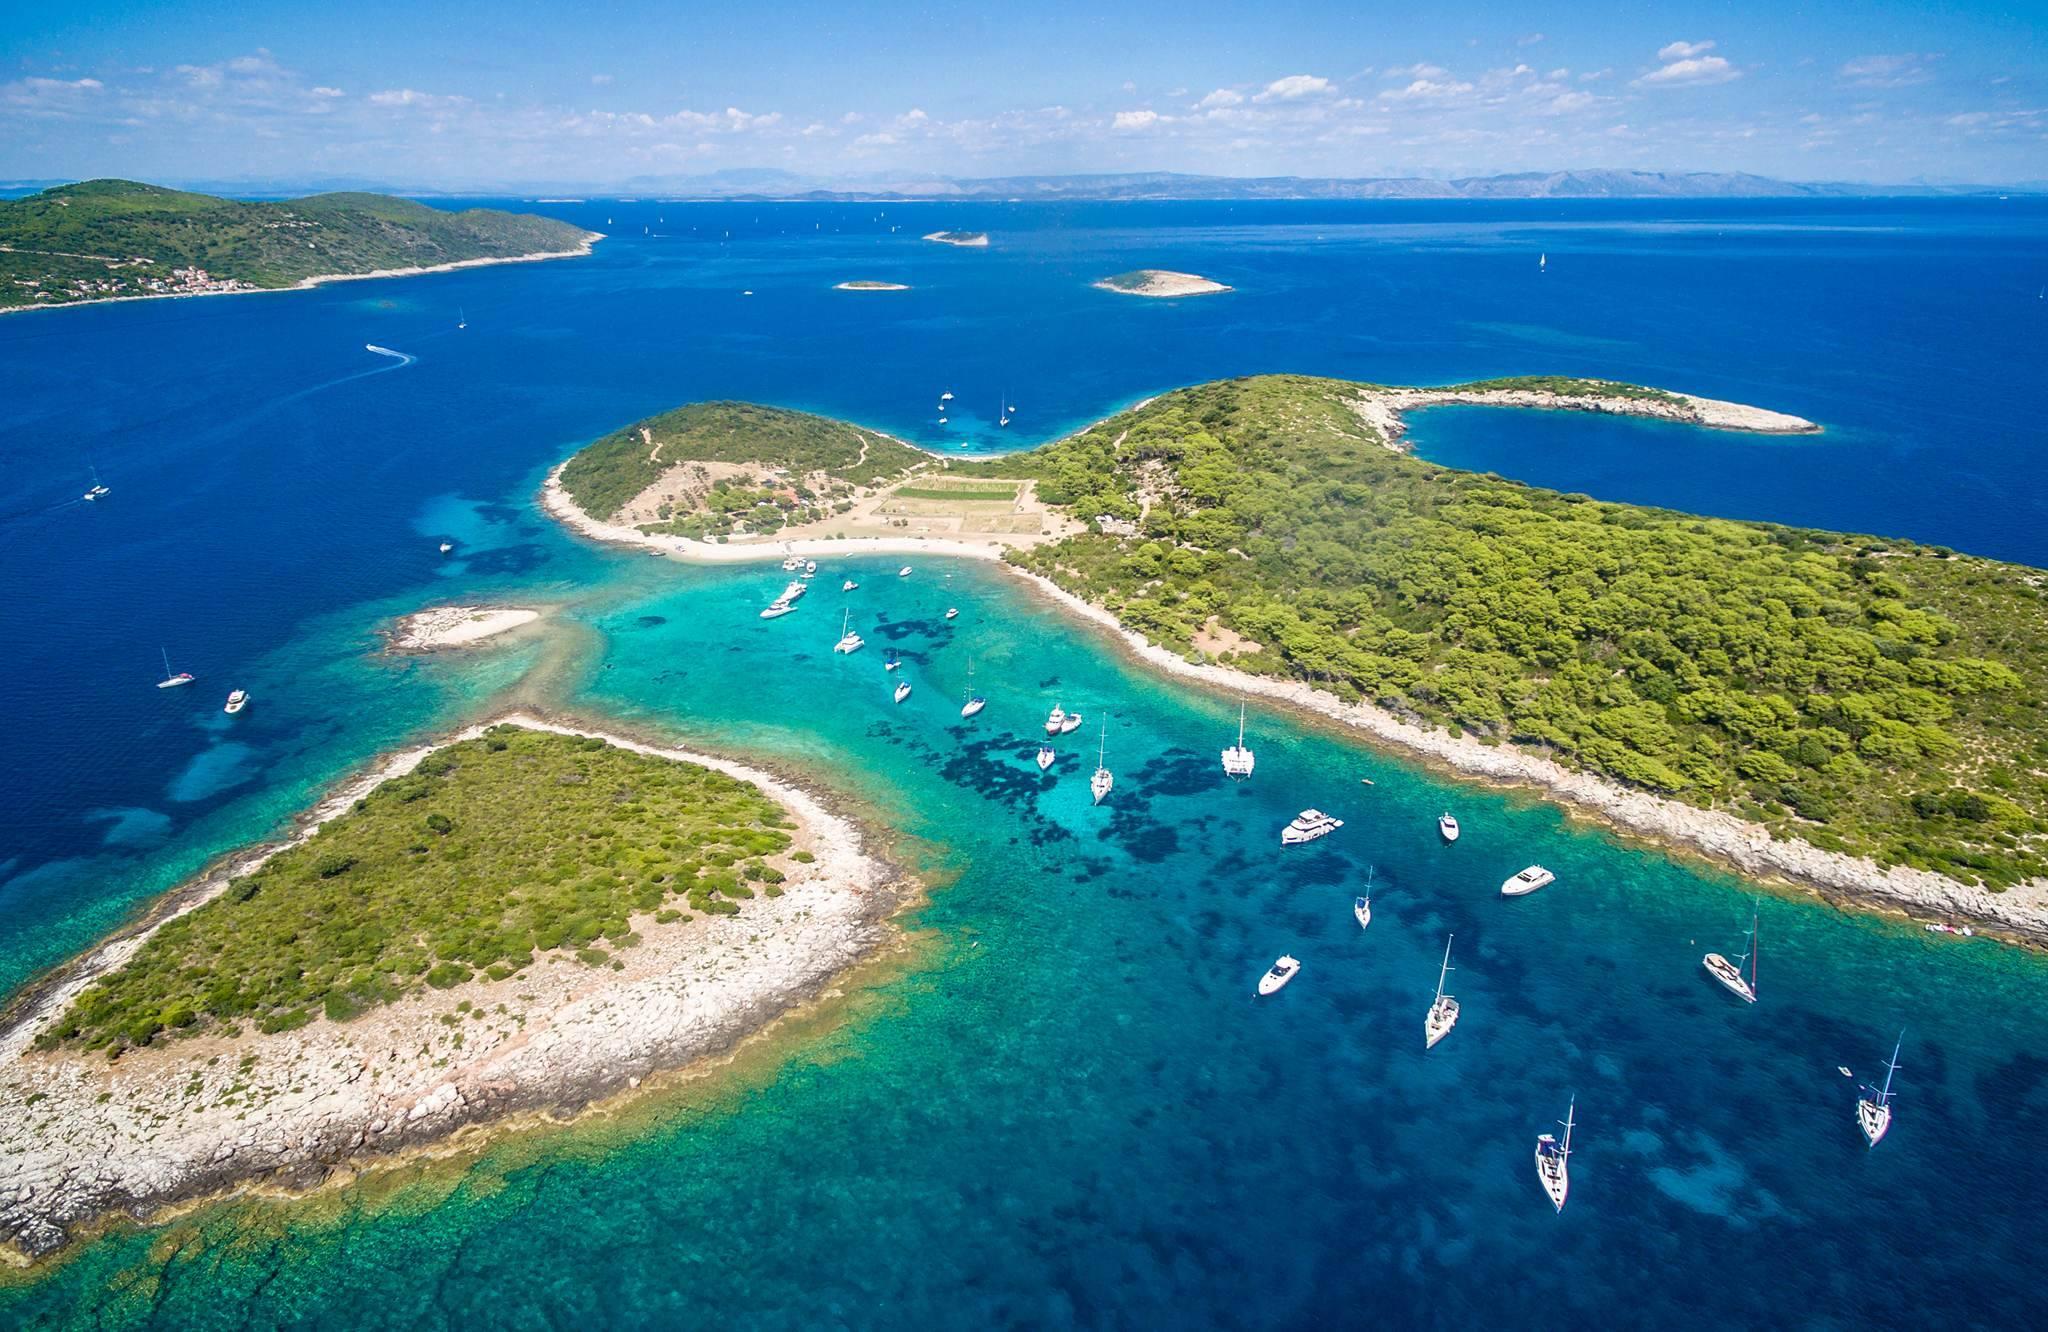 Croatia has over 1,200 islands (photo credit: Ante Babic)